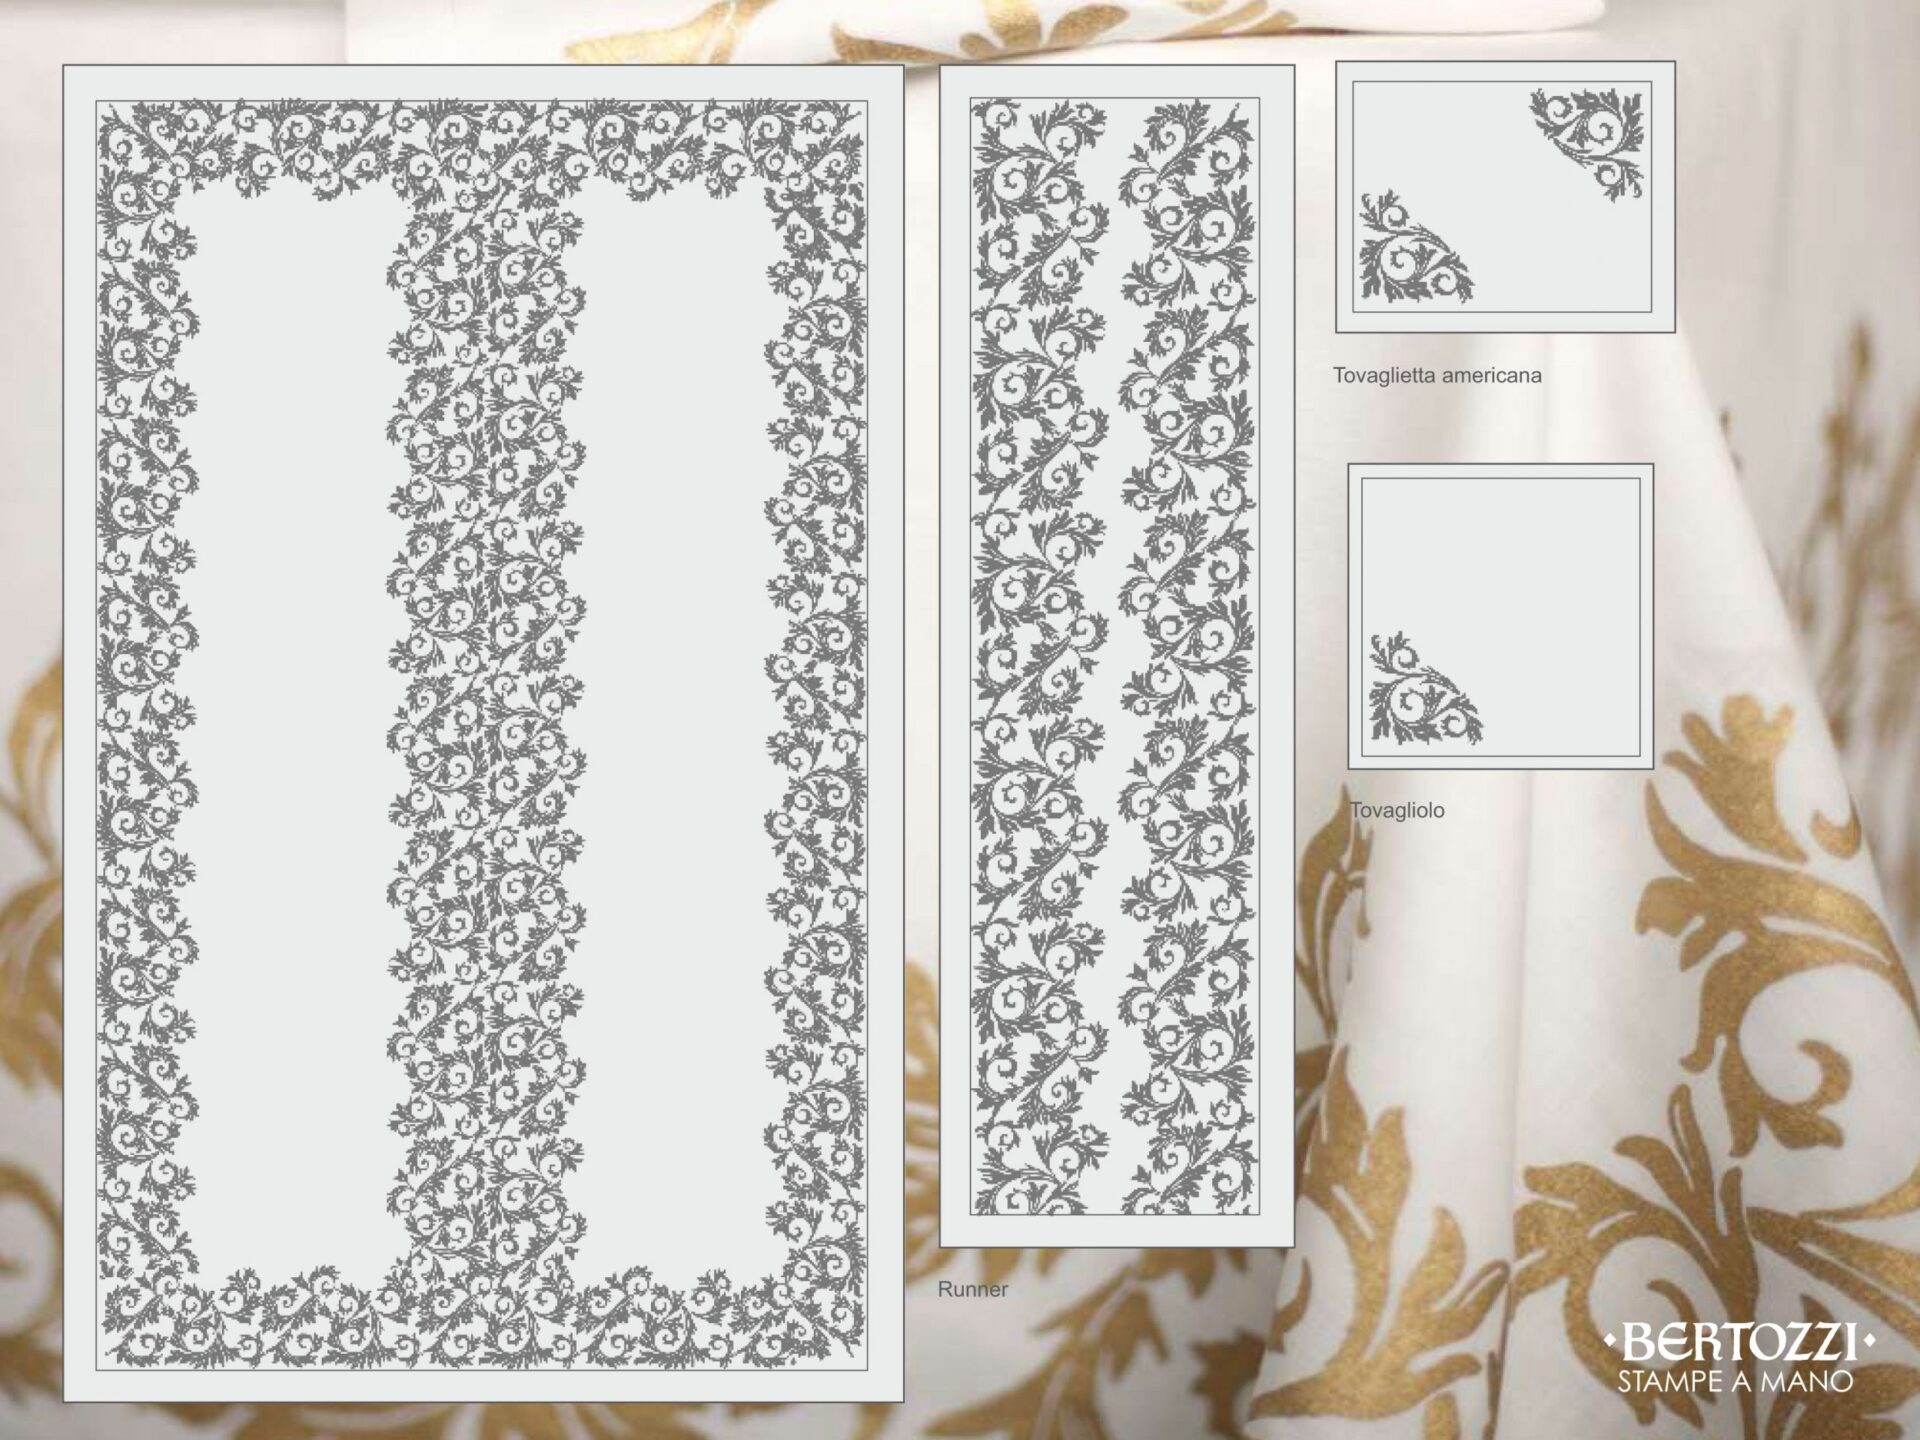 bespoke design of tablecloth